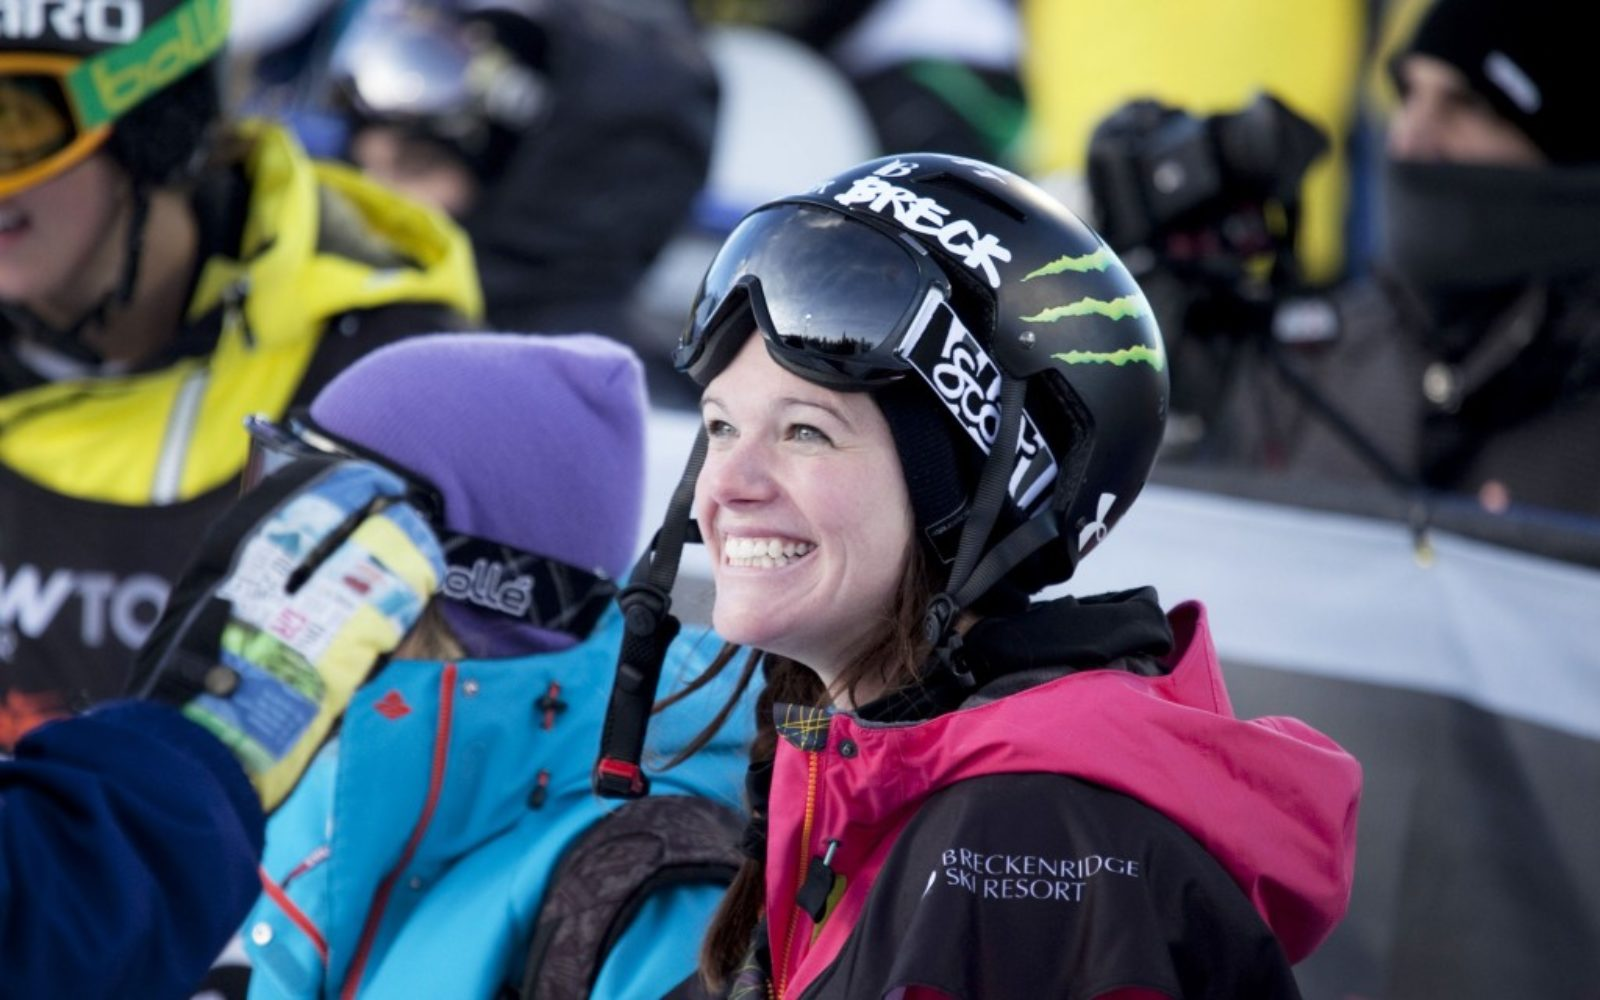 sports-xgames-skier-fun2-1024x640